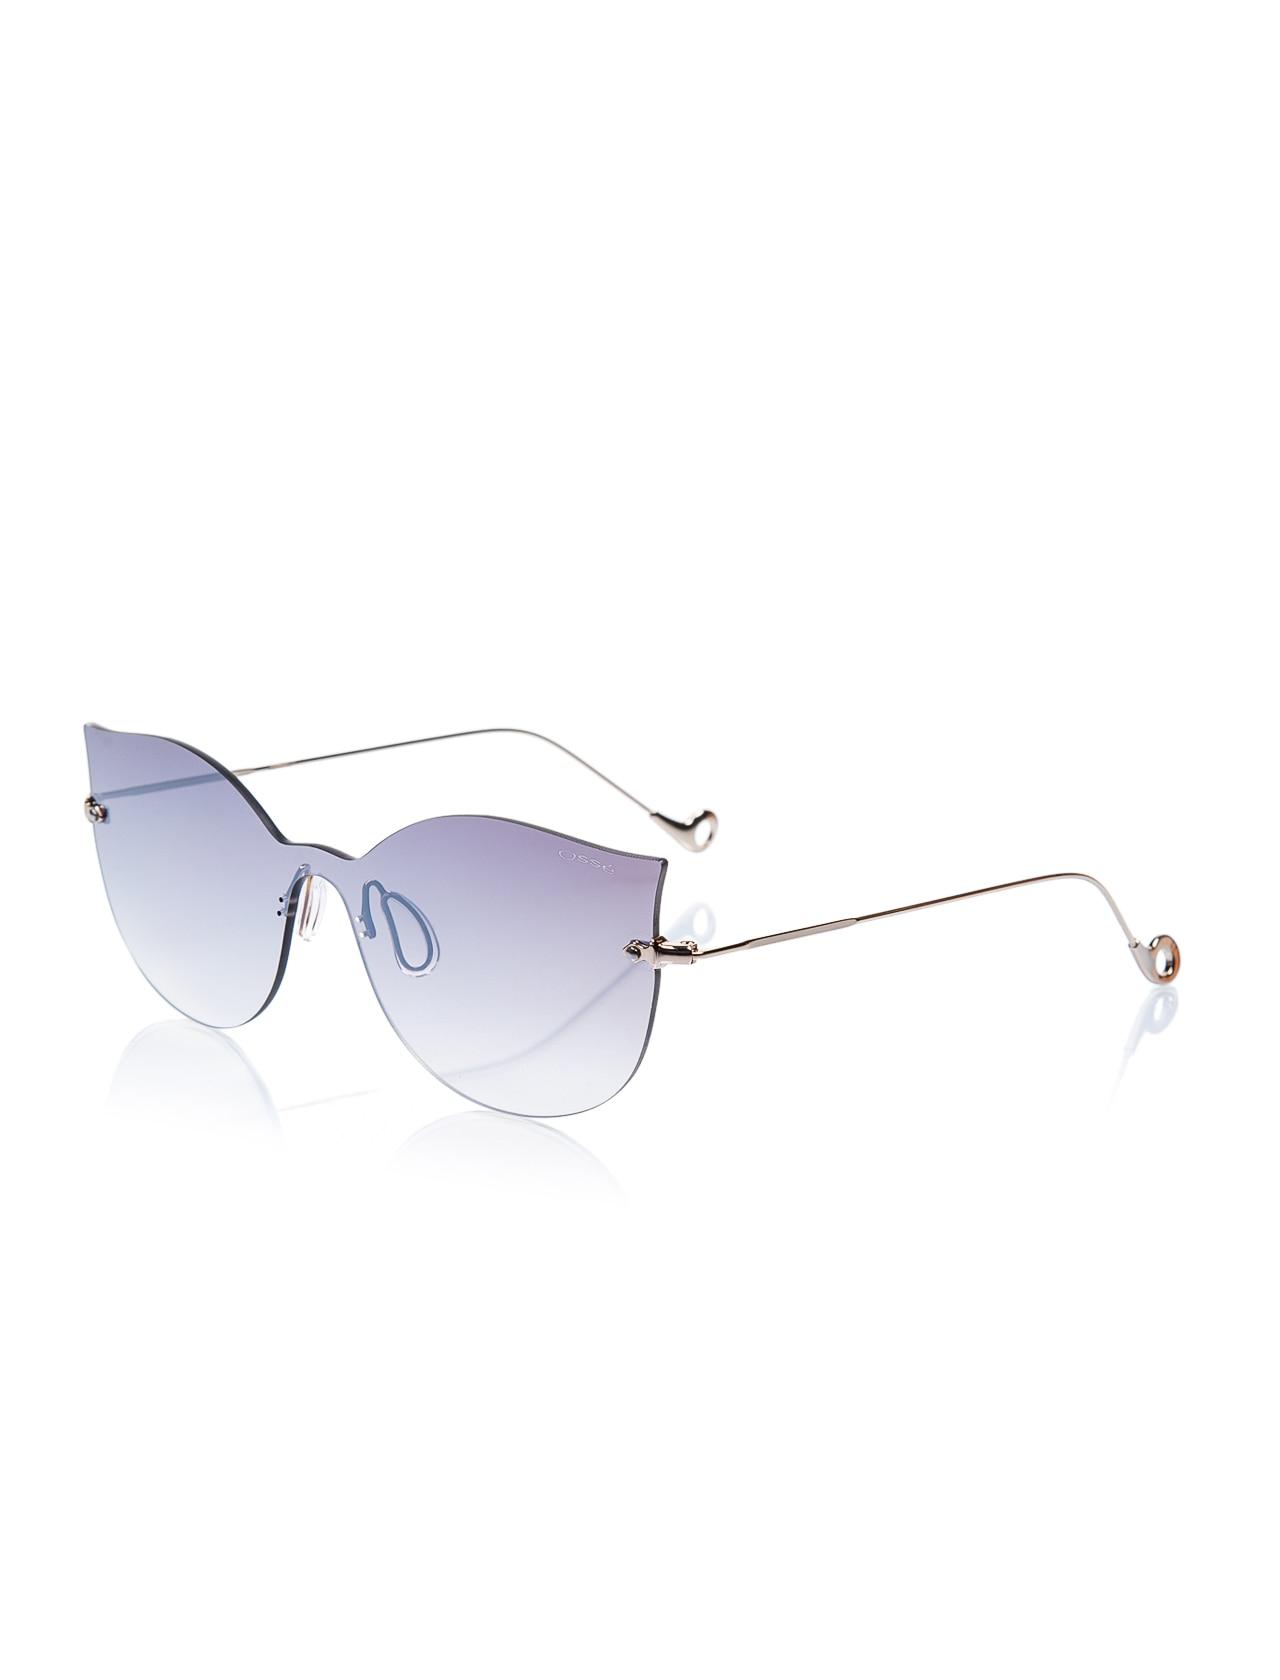 Women's sunglasses os 2639 02 unibody gold organic butterfly cat eye 54-13-145 osse